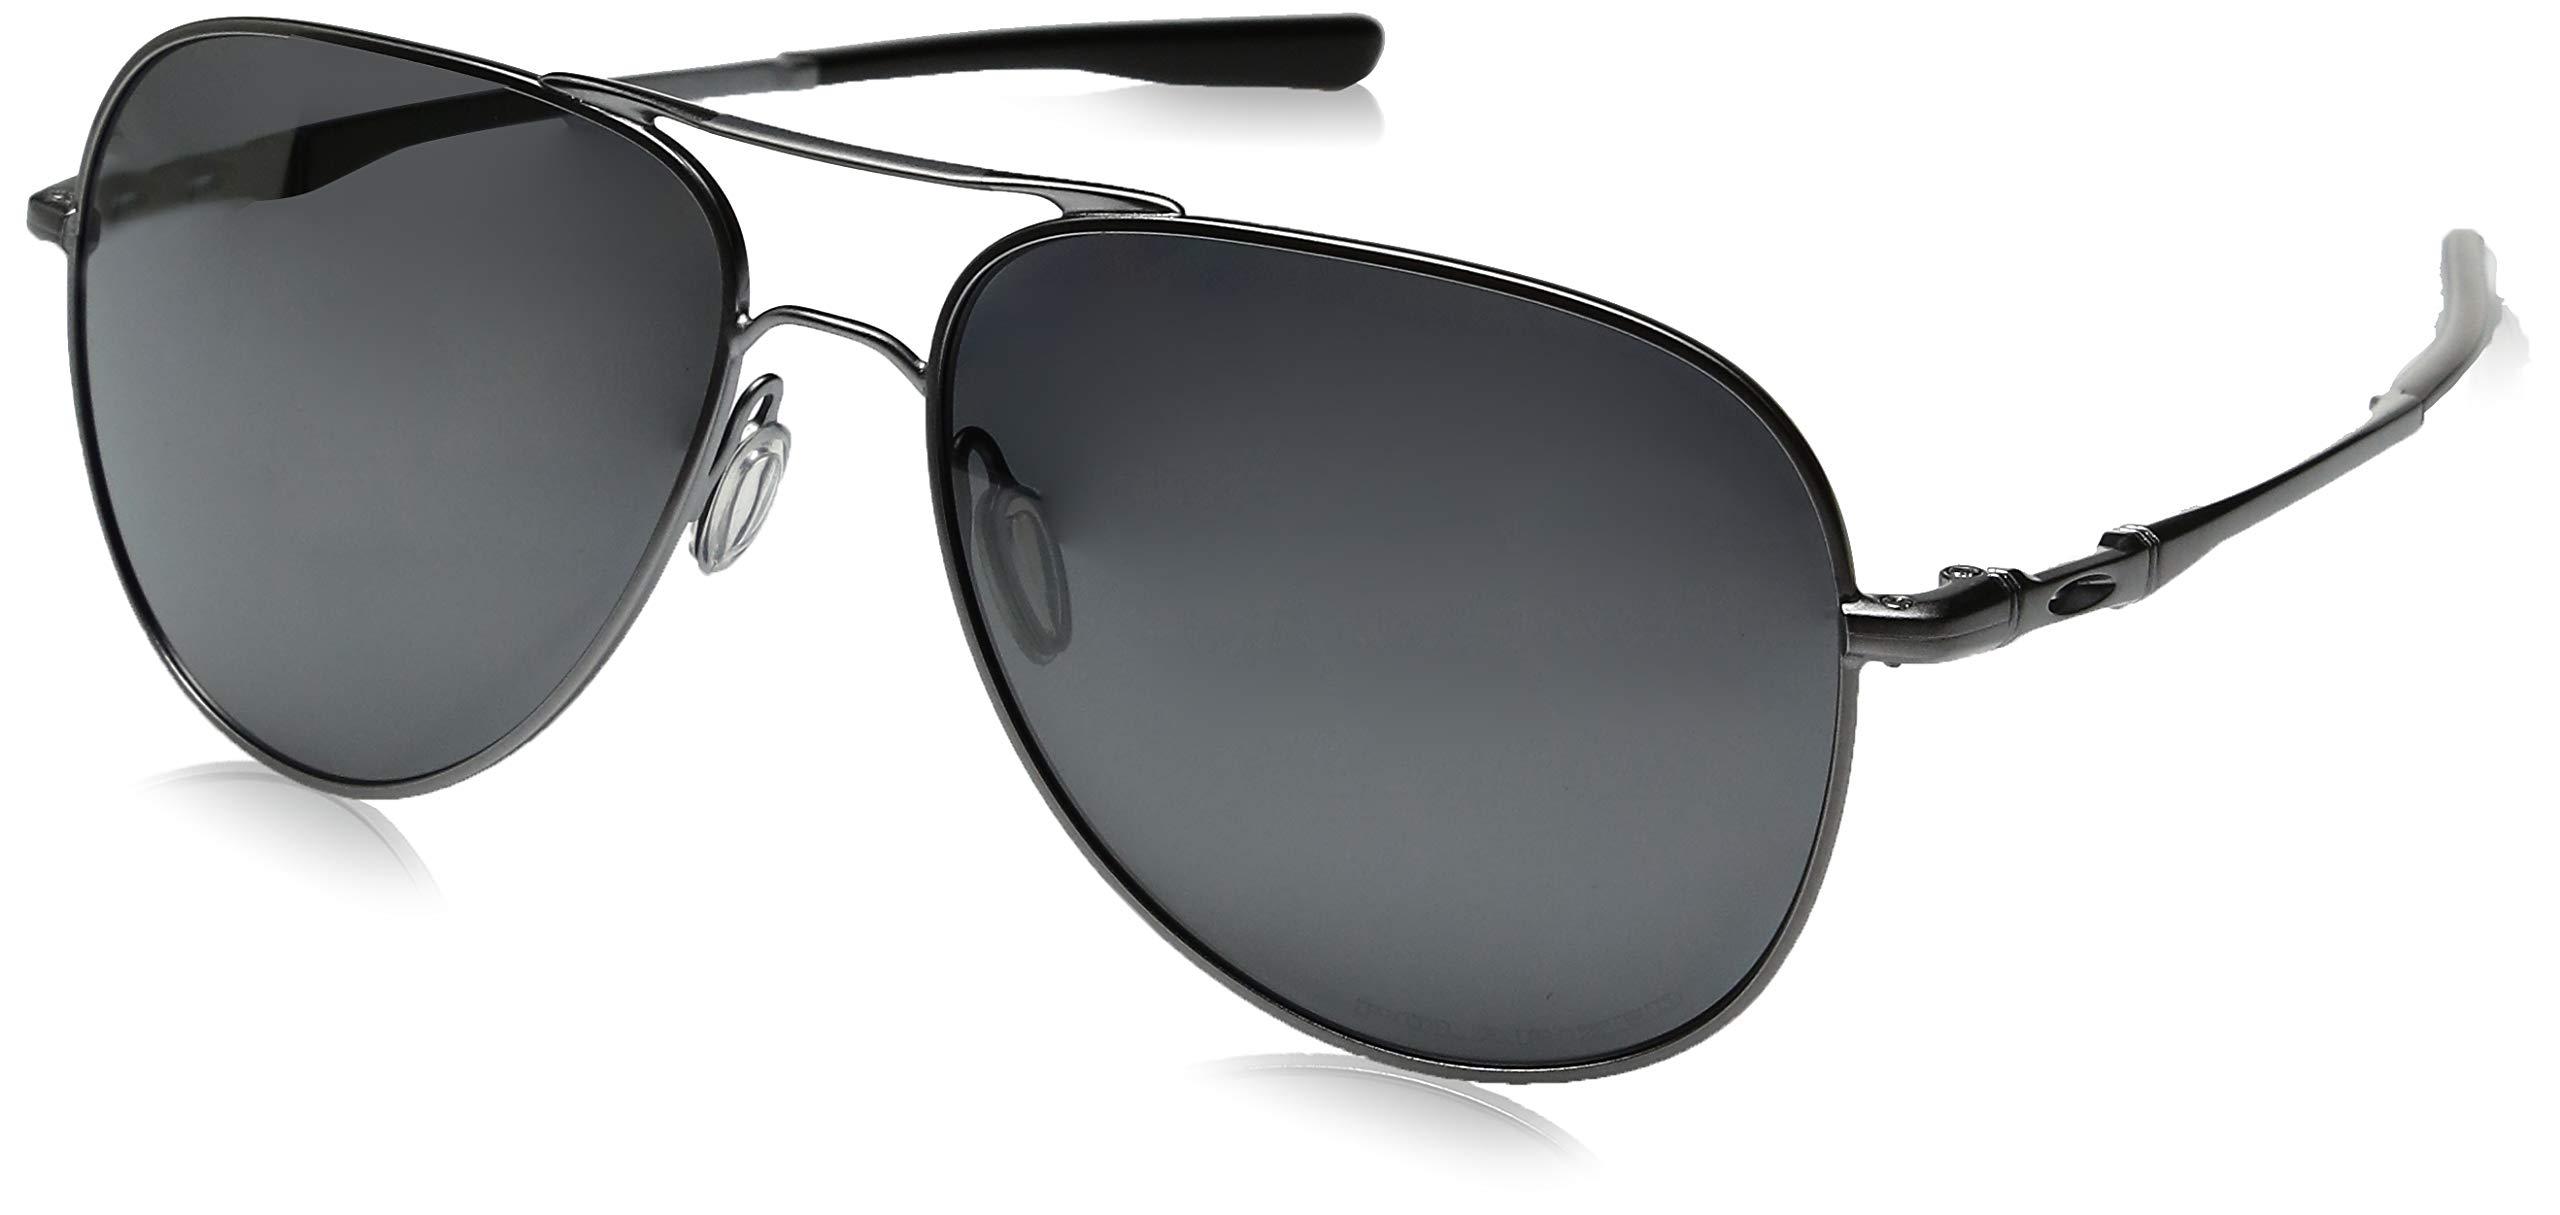 Oakley Men's Elmont M Sunglasses,Lead/Black